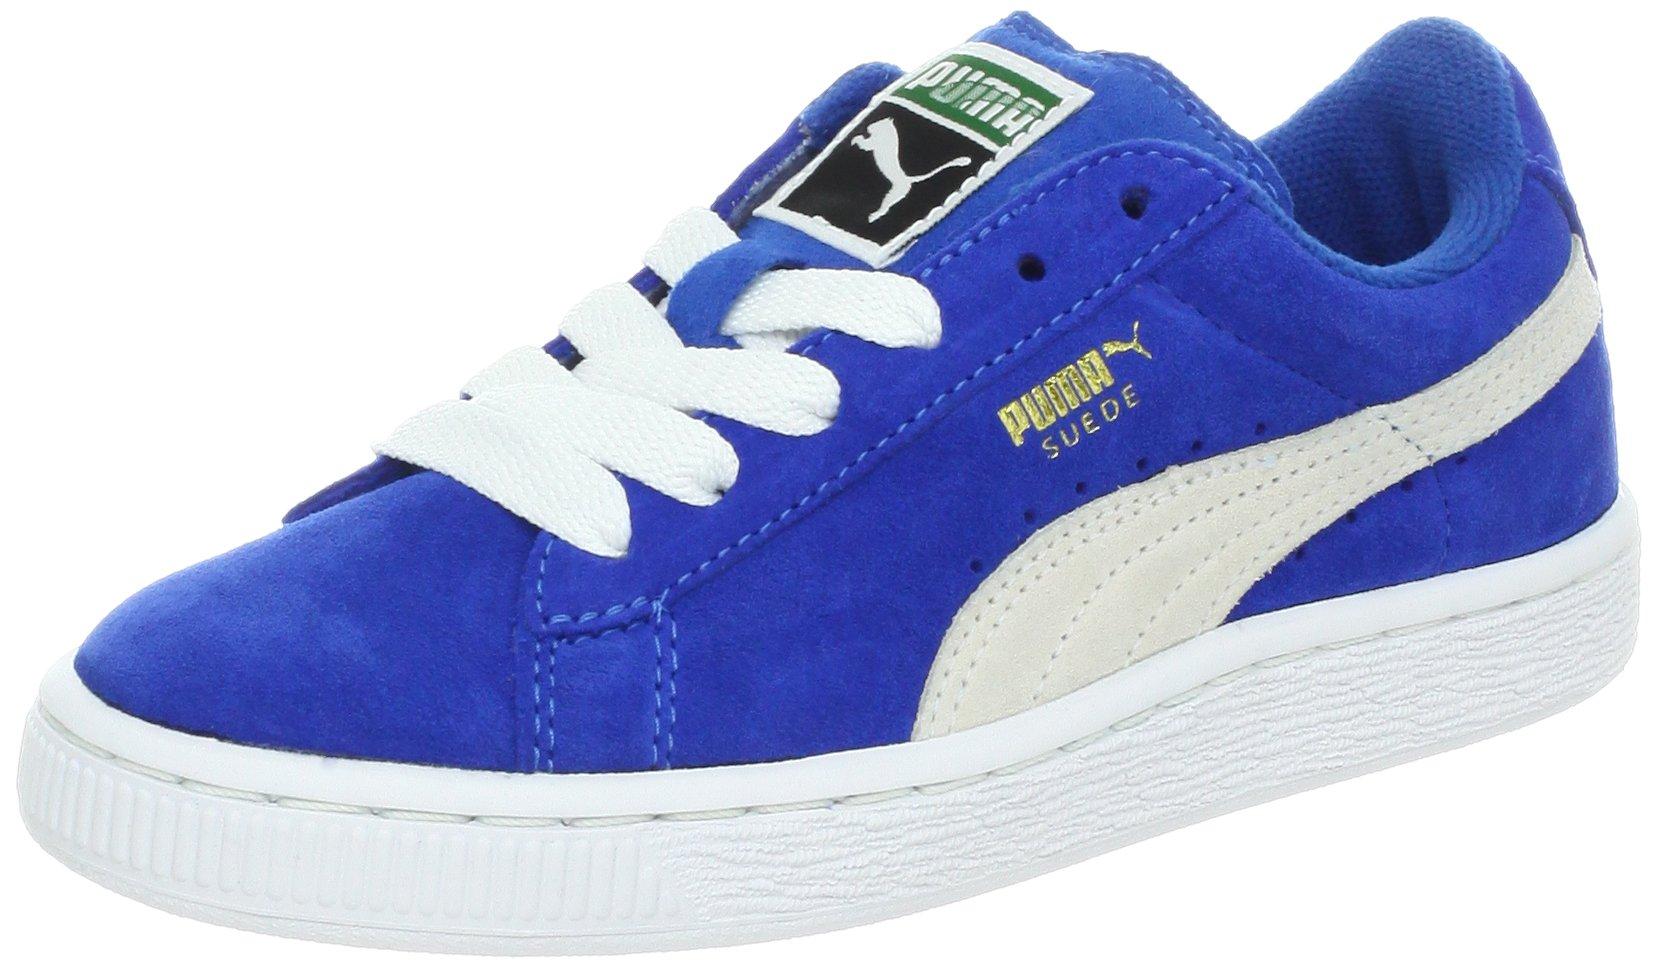 PUMA Suede Junior Sneaker (Little Kid/Big Kid) , Snorkel Blue/White, 1 M US Little Kid